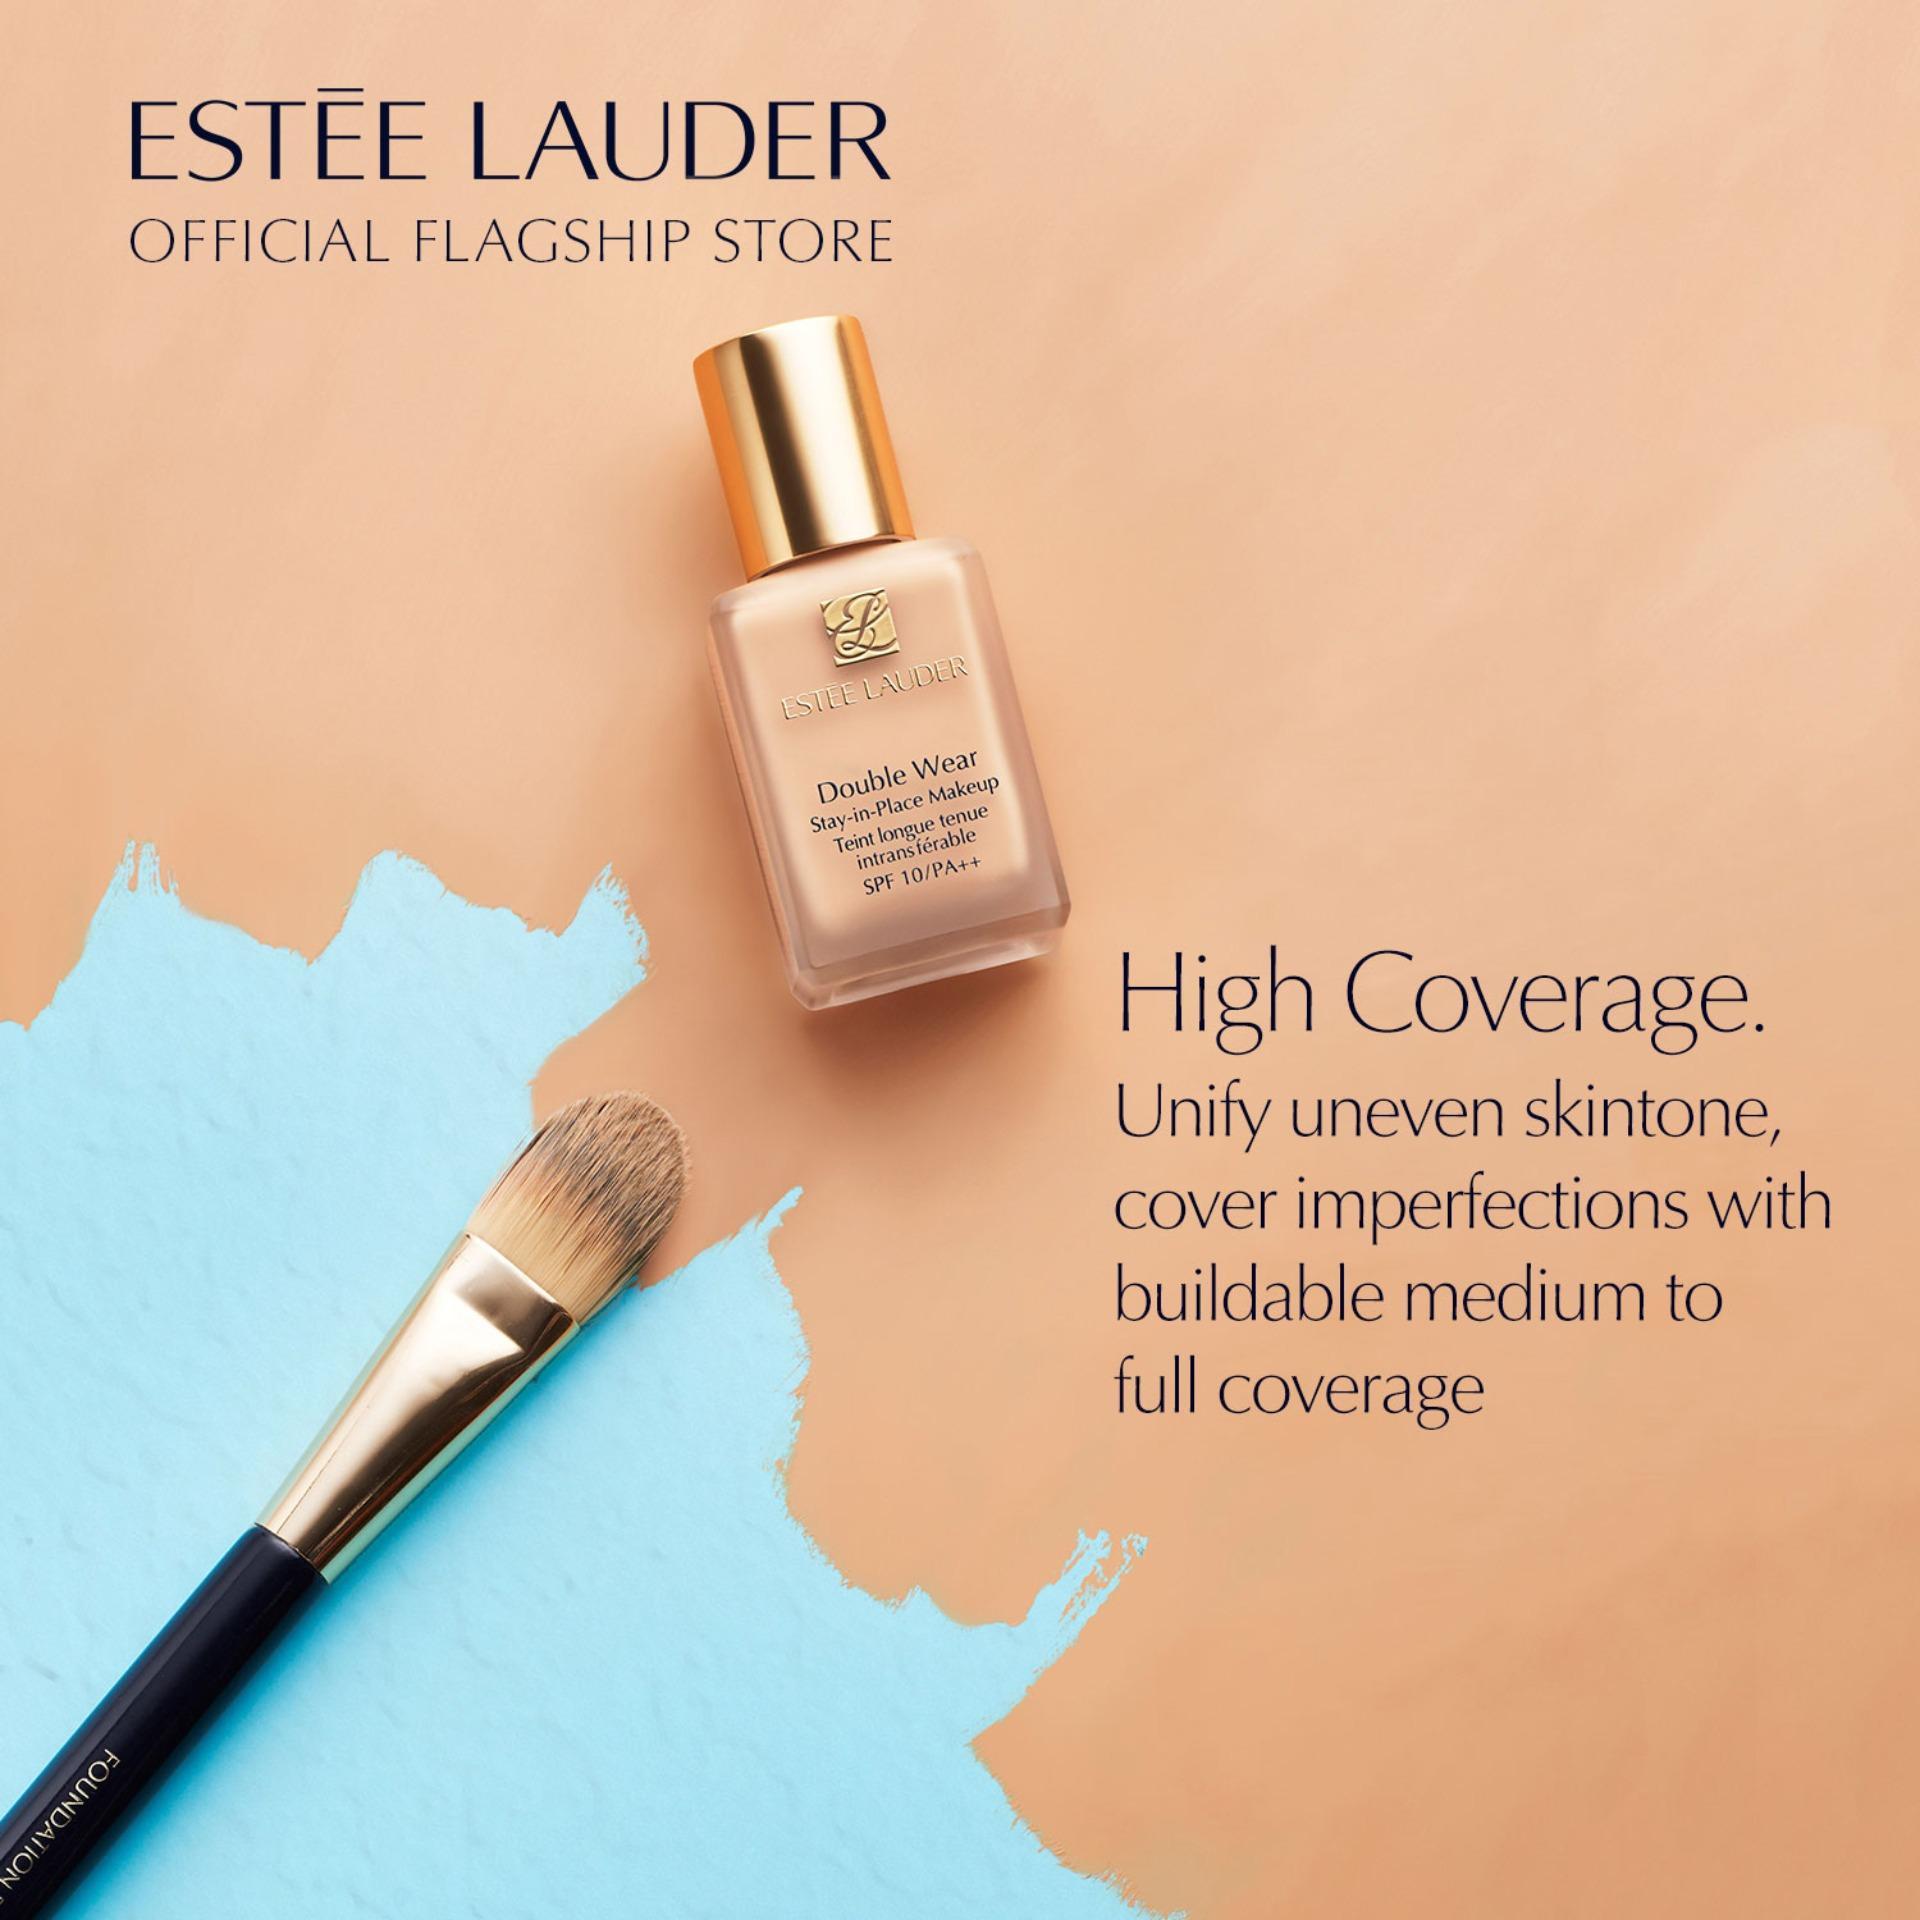 Estee Lauder Foundation Double Wear Stay In Place Spf 10 2w1 Sand 36 Wood Mystique Edp Parfum Wanita 100 Ml Original Makeup